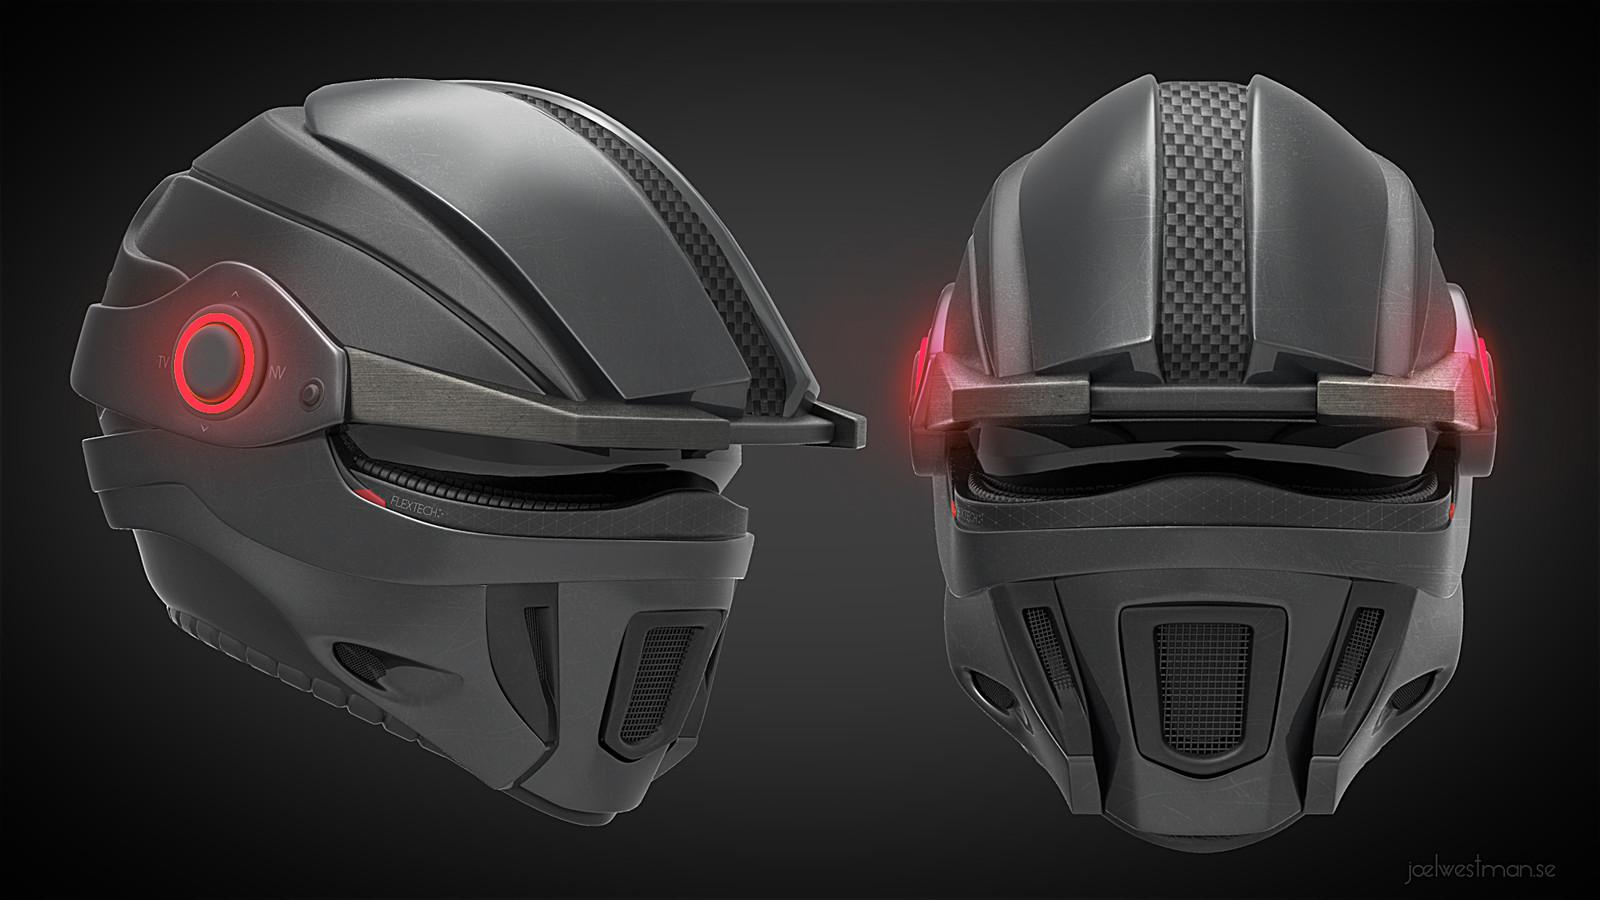 BEAST - Helmet Design